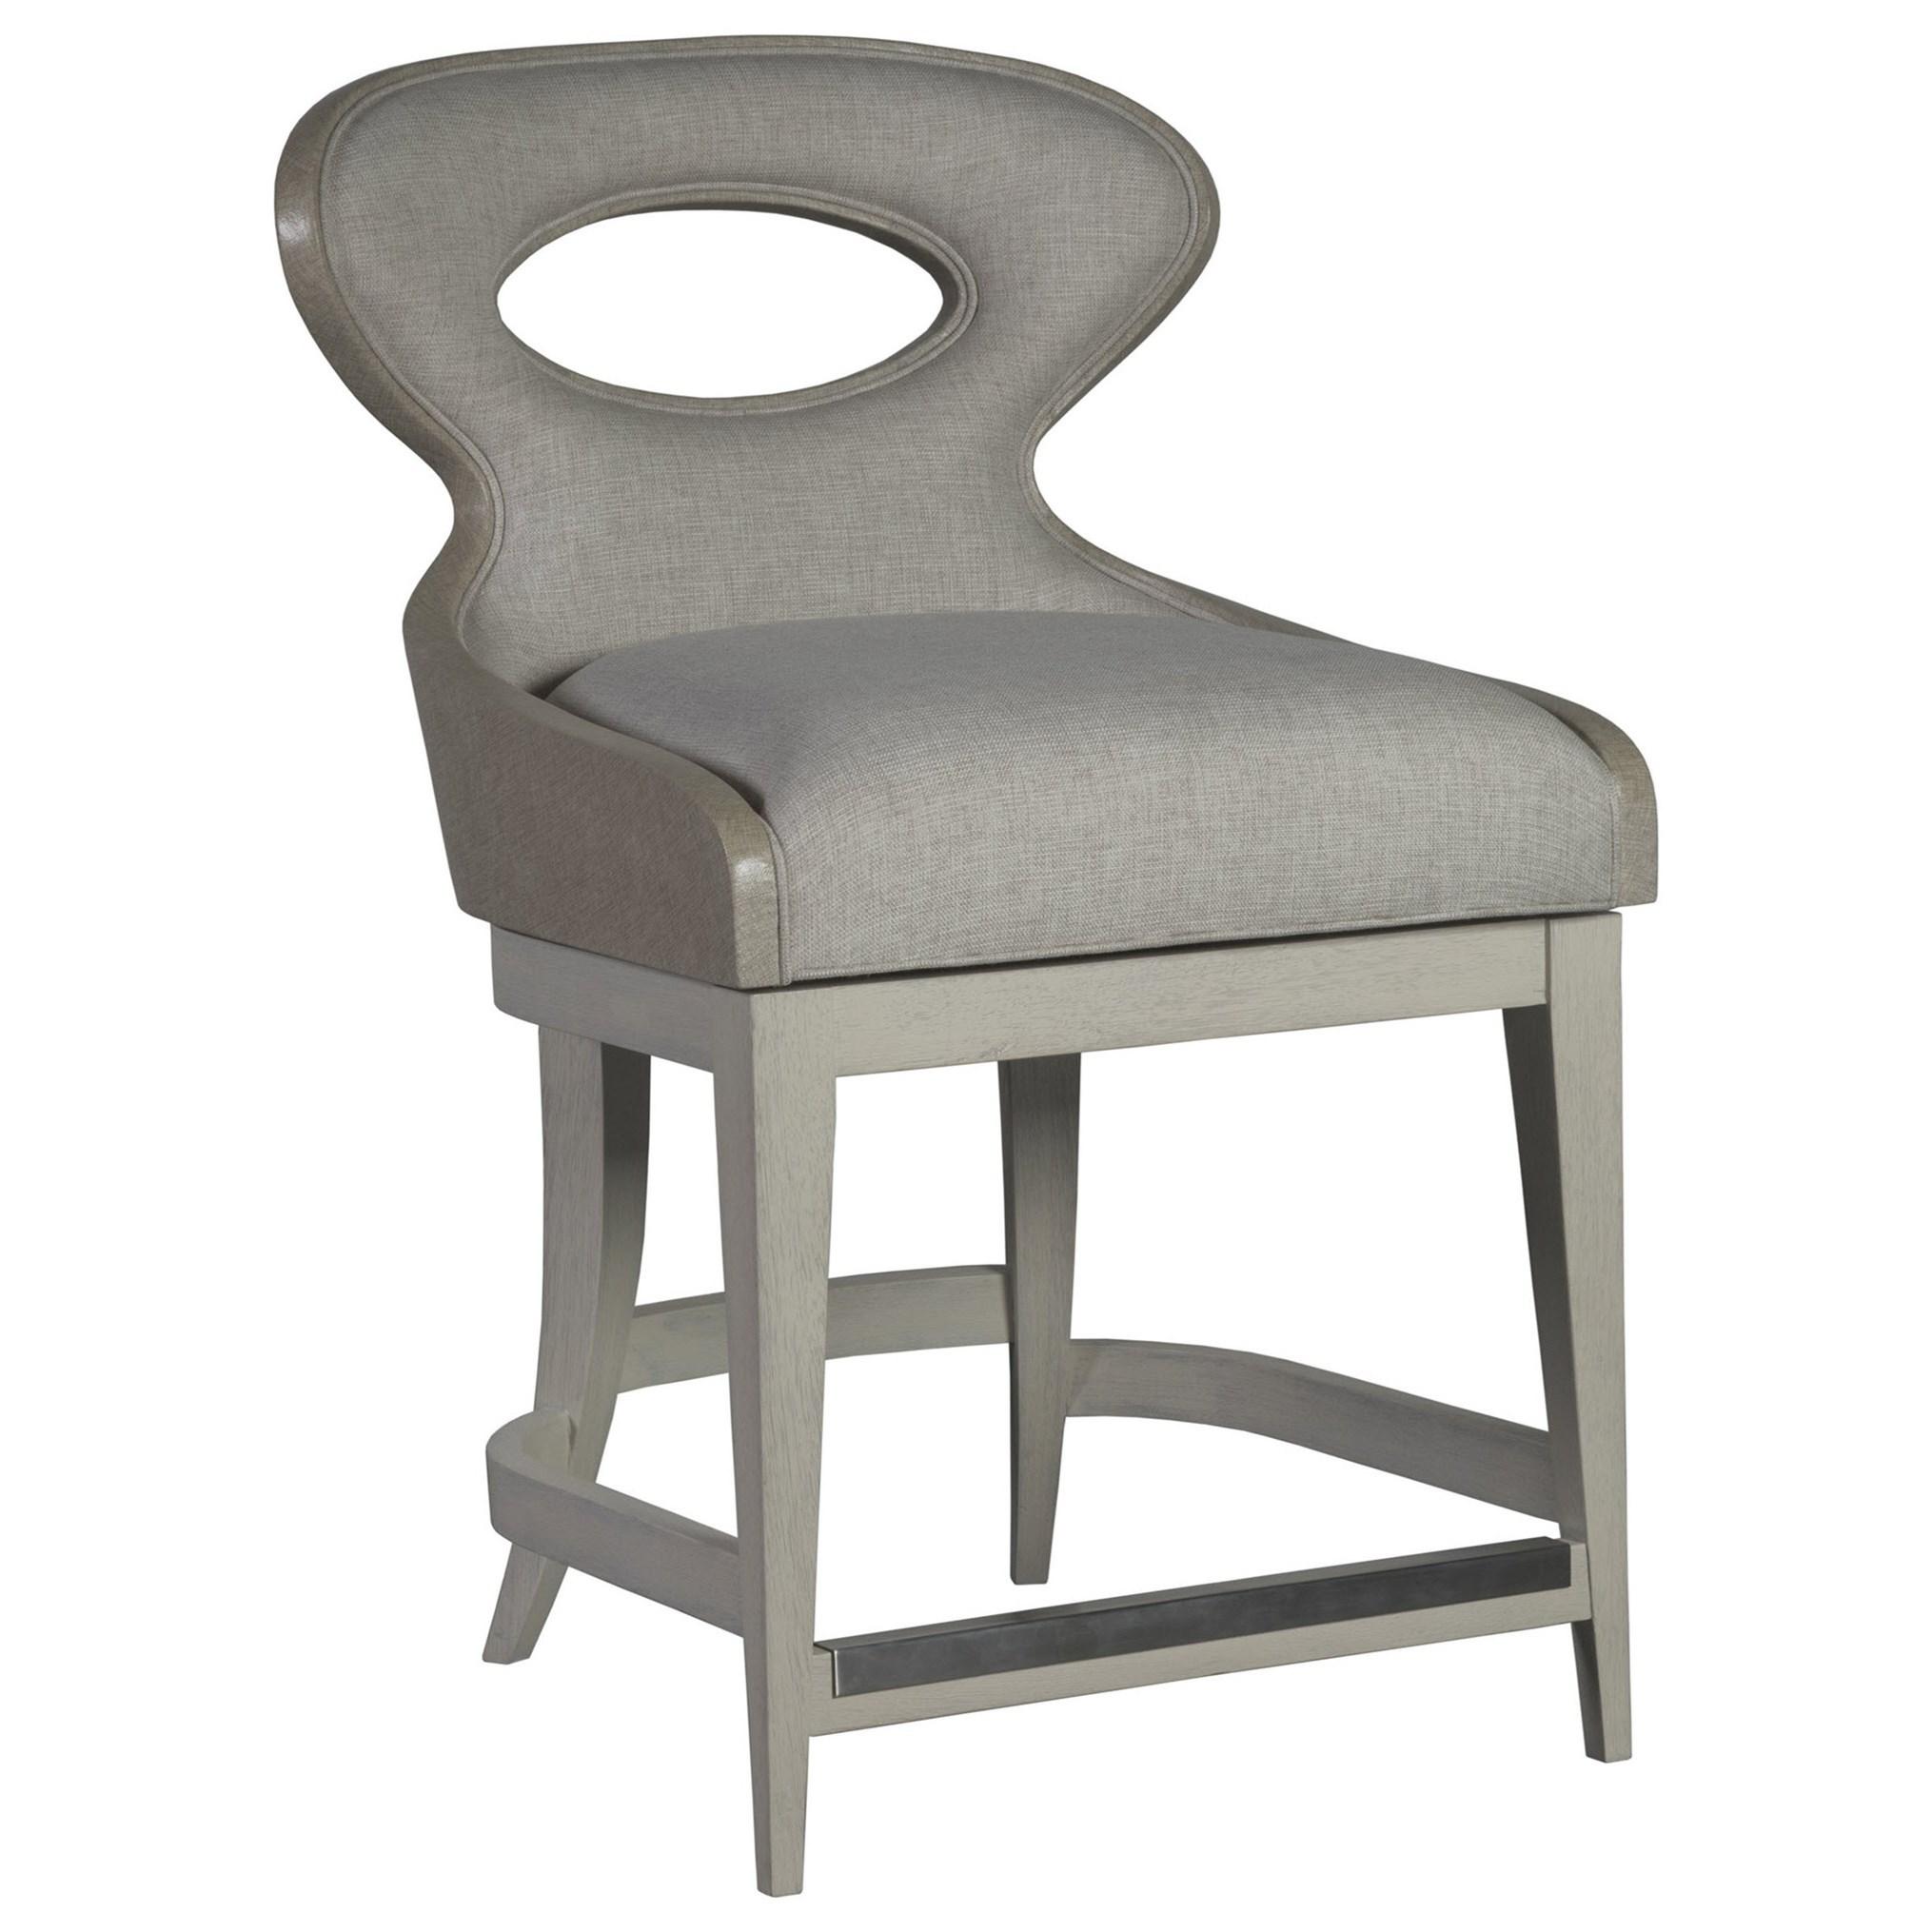 Zeitgeist Linen Upholstered Swivel Counter Stool by Artistica at Baer's Furniture